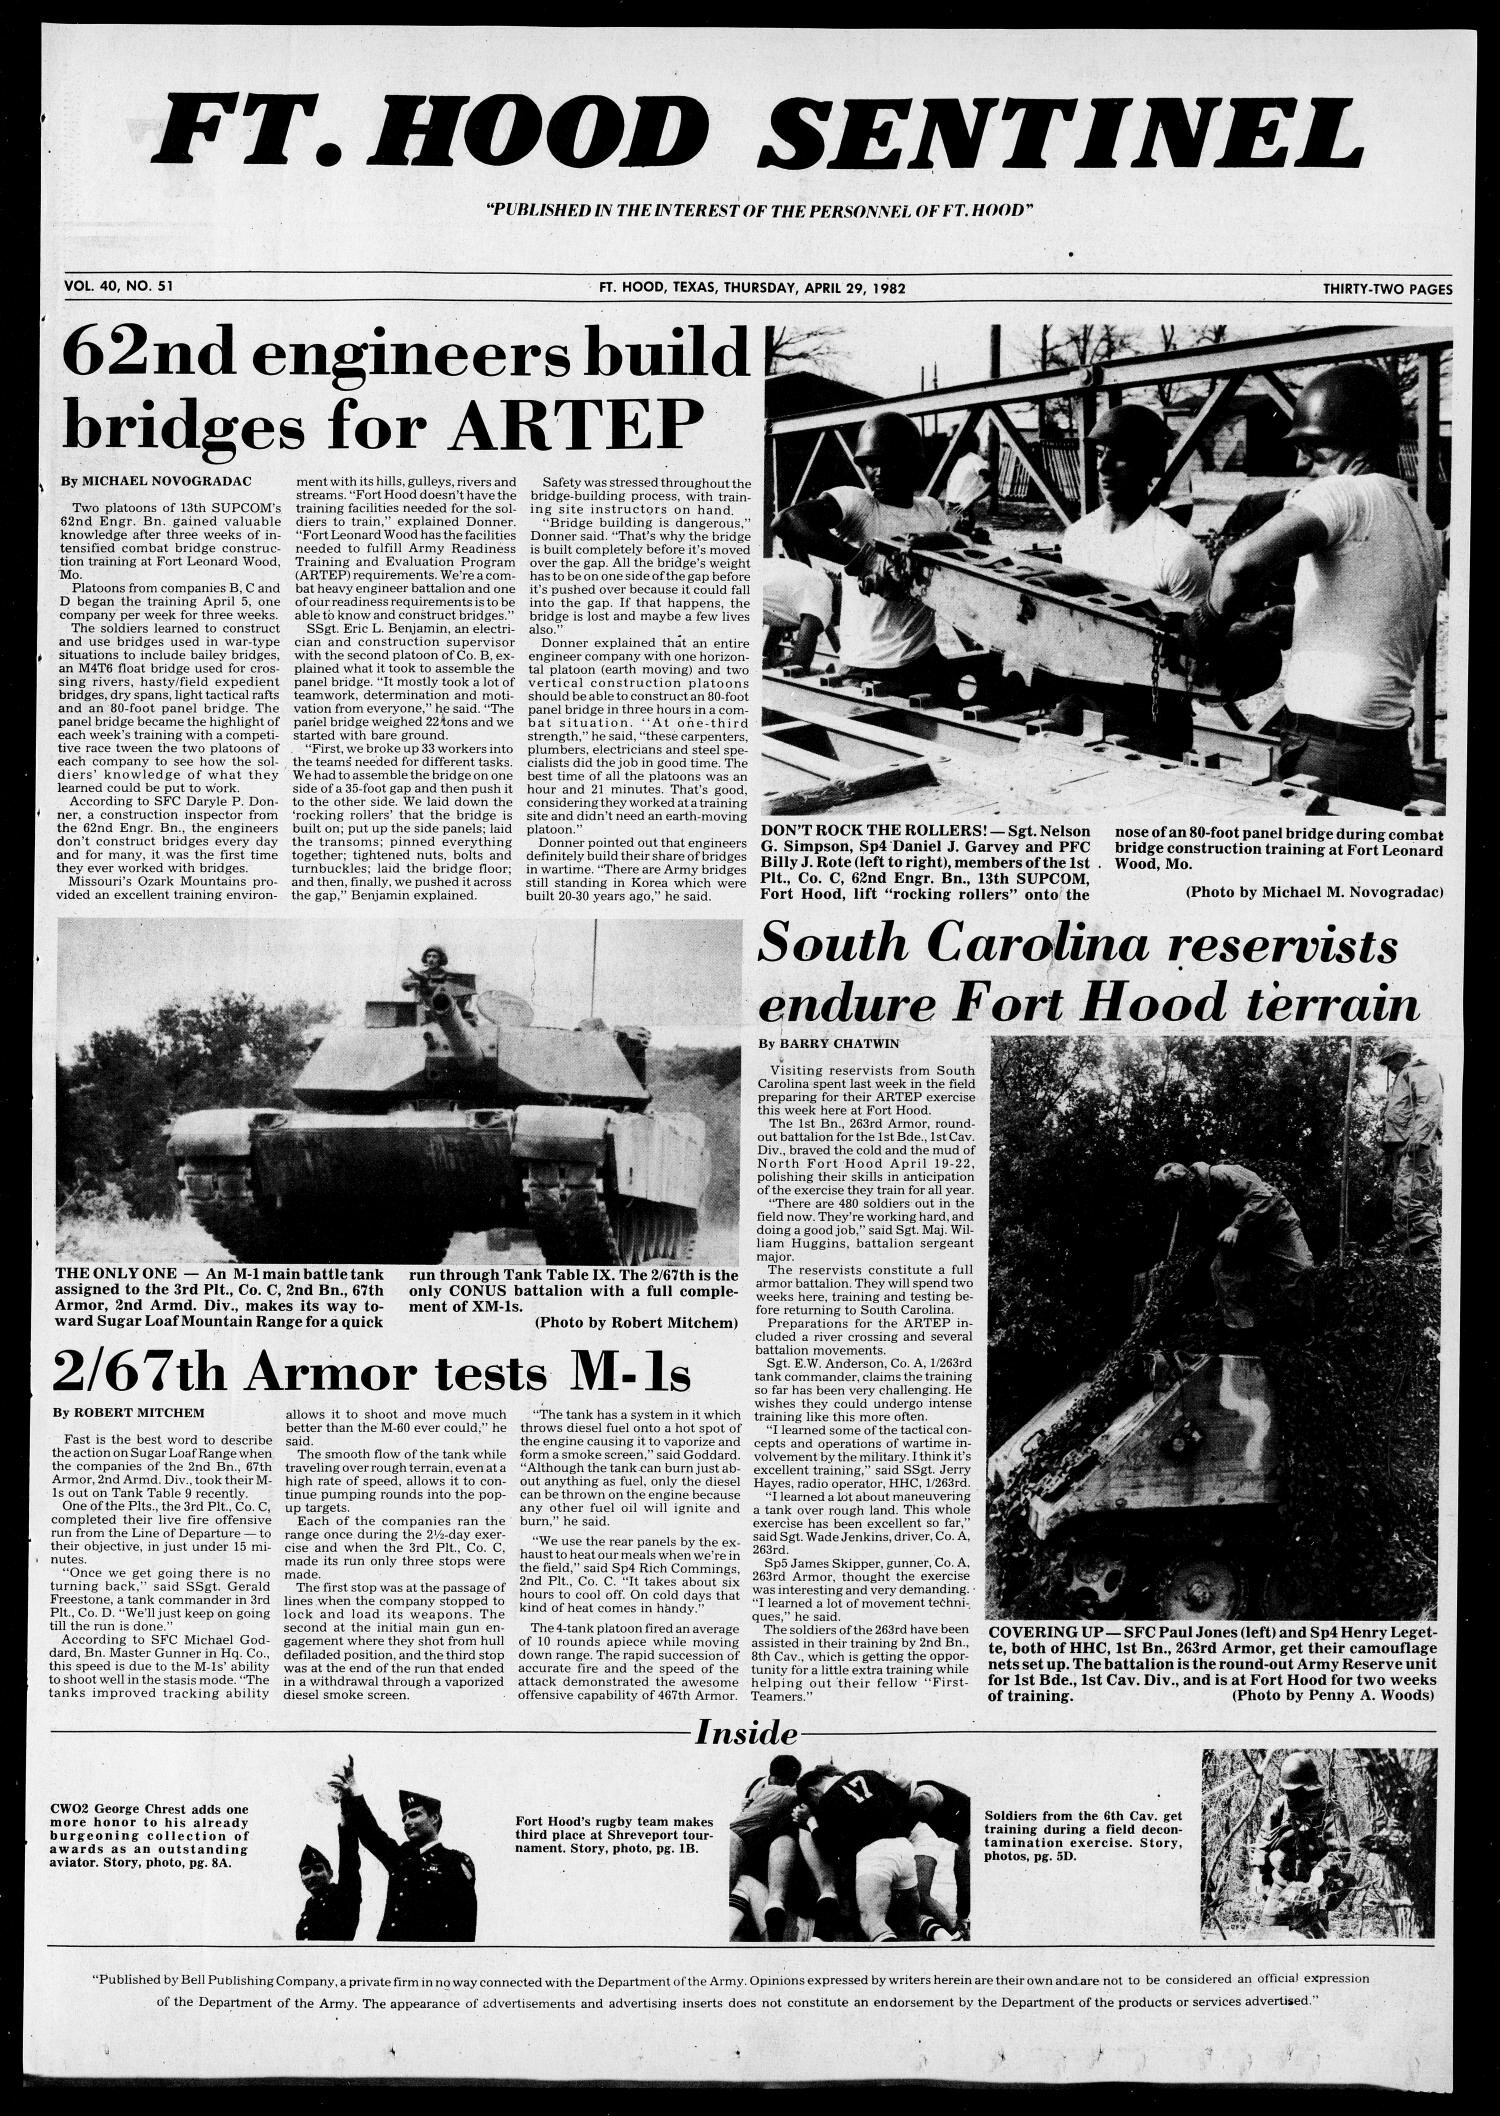 FT. HOOD SENTINEL_29 APR 1982.jpg